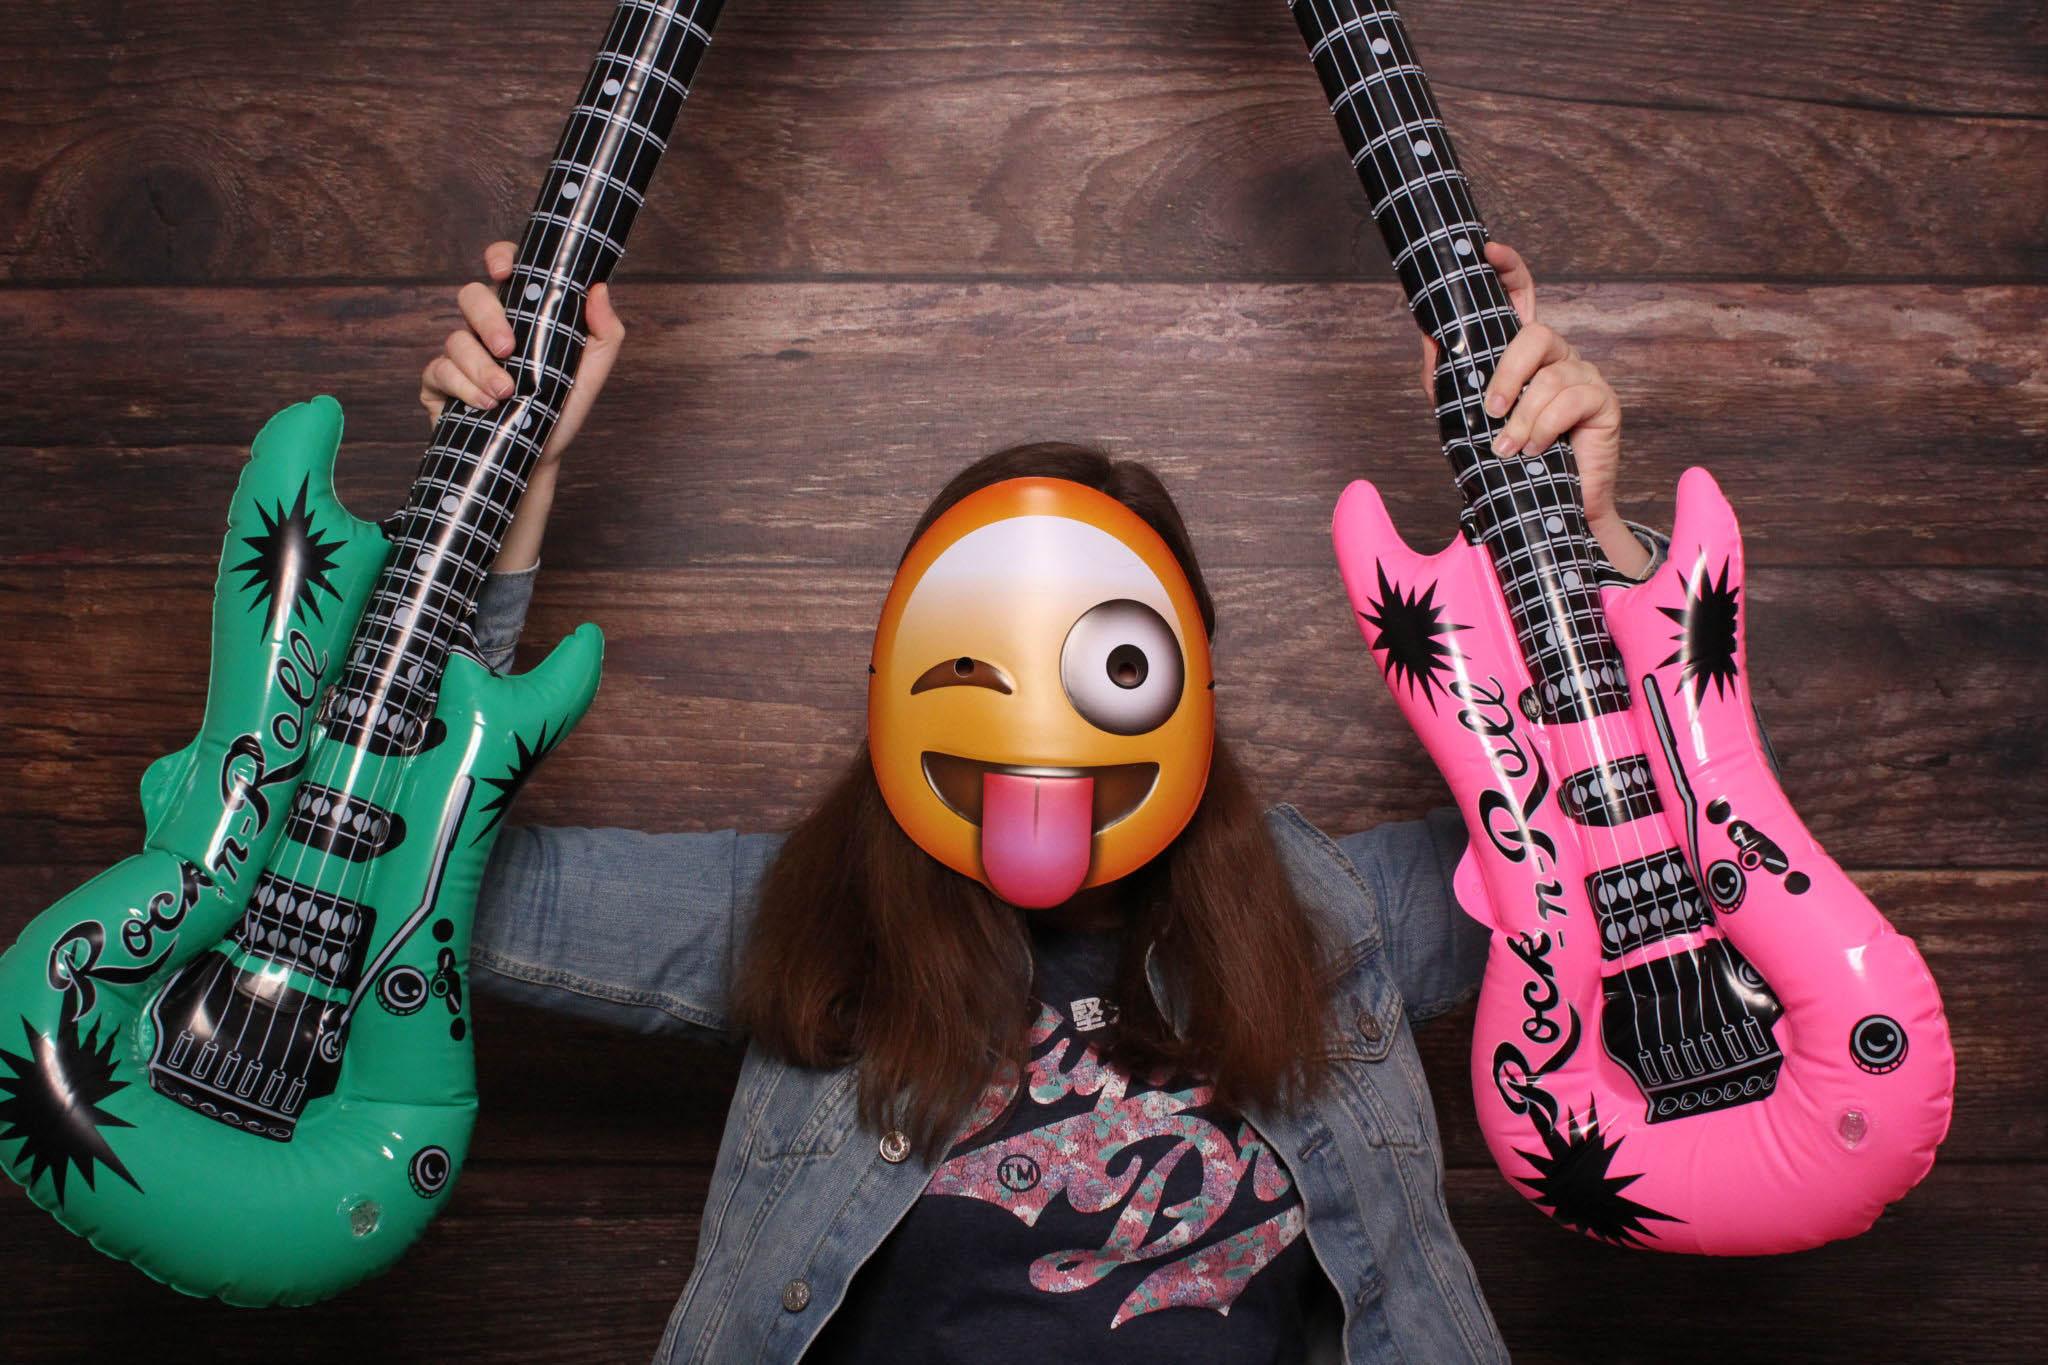 Fotobox Weinheim - guitar 2